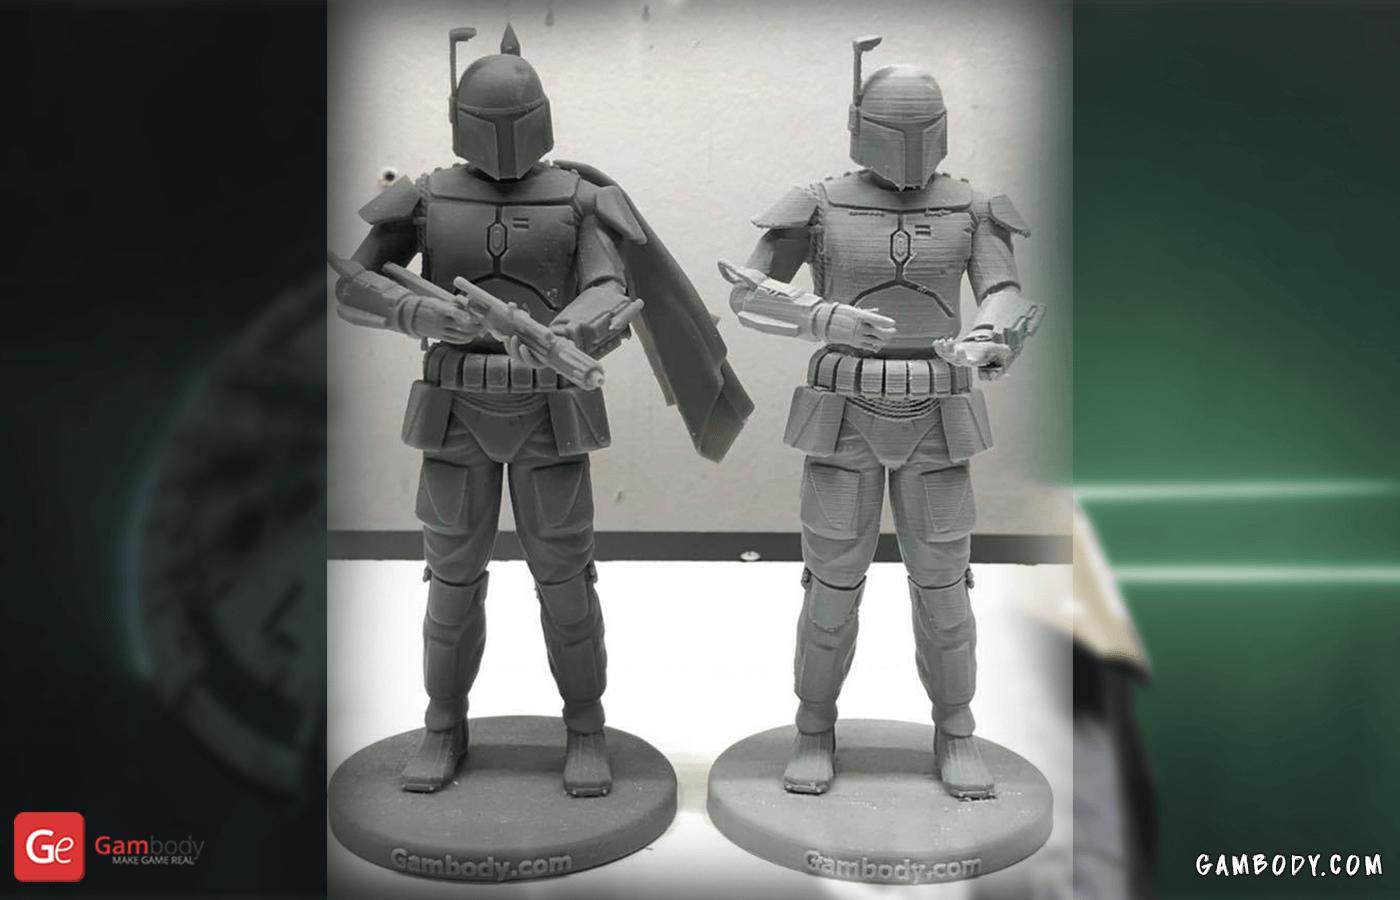 Boba Fett 3D Printing Figurine